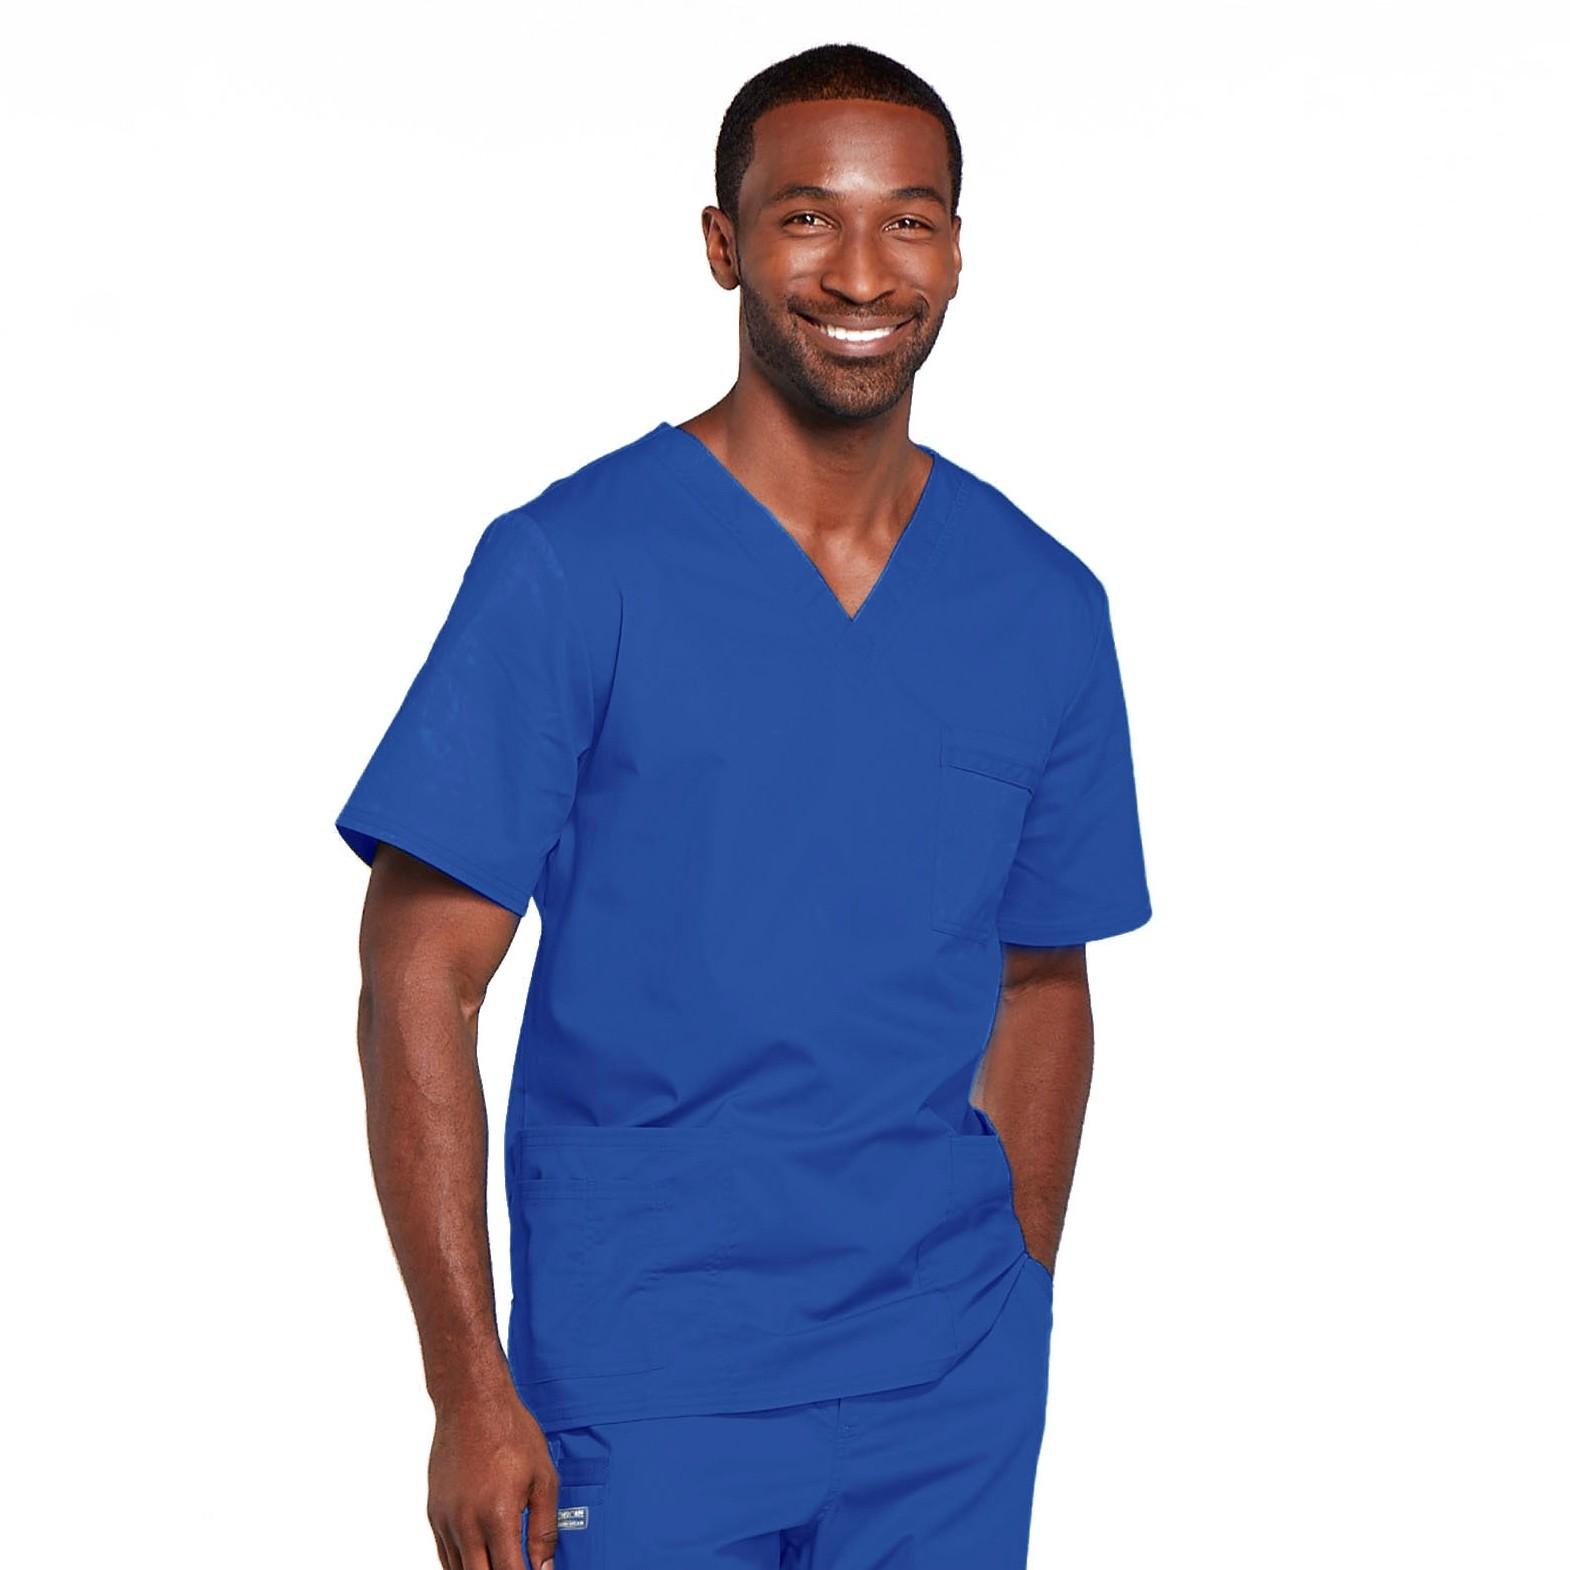 Мужской медицинский костюм прямого силуэта Core Stretch цвет- светло-синий.